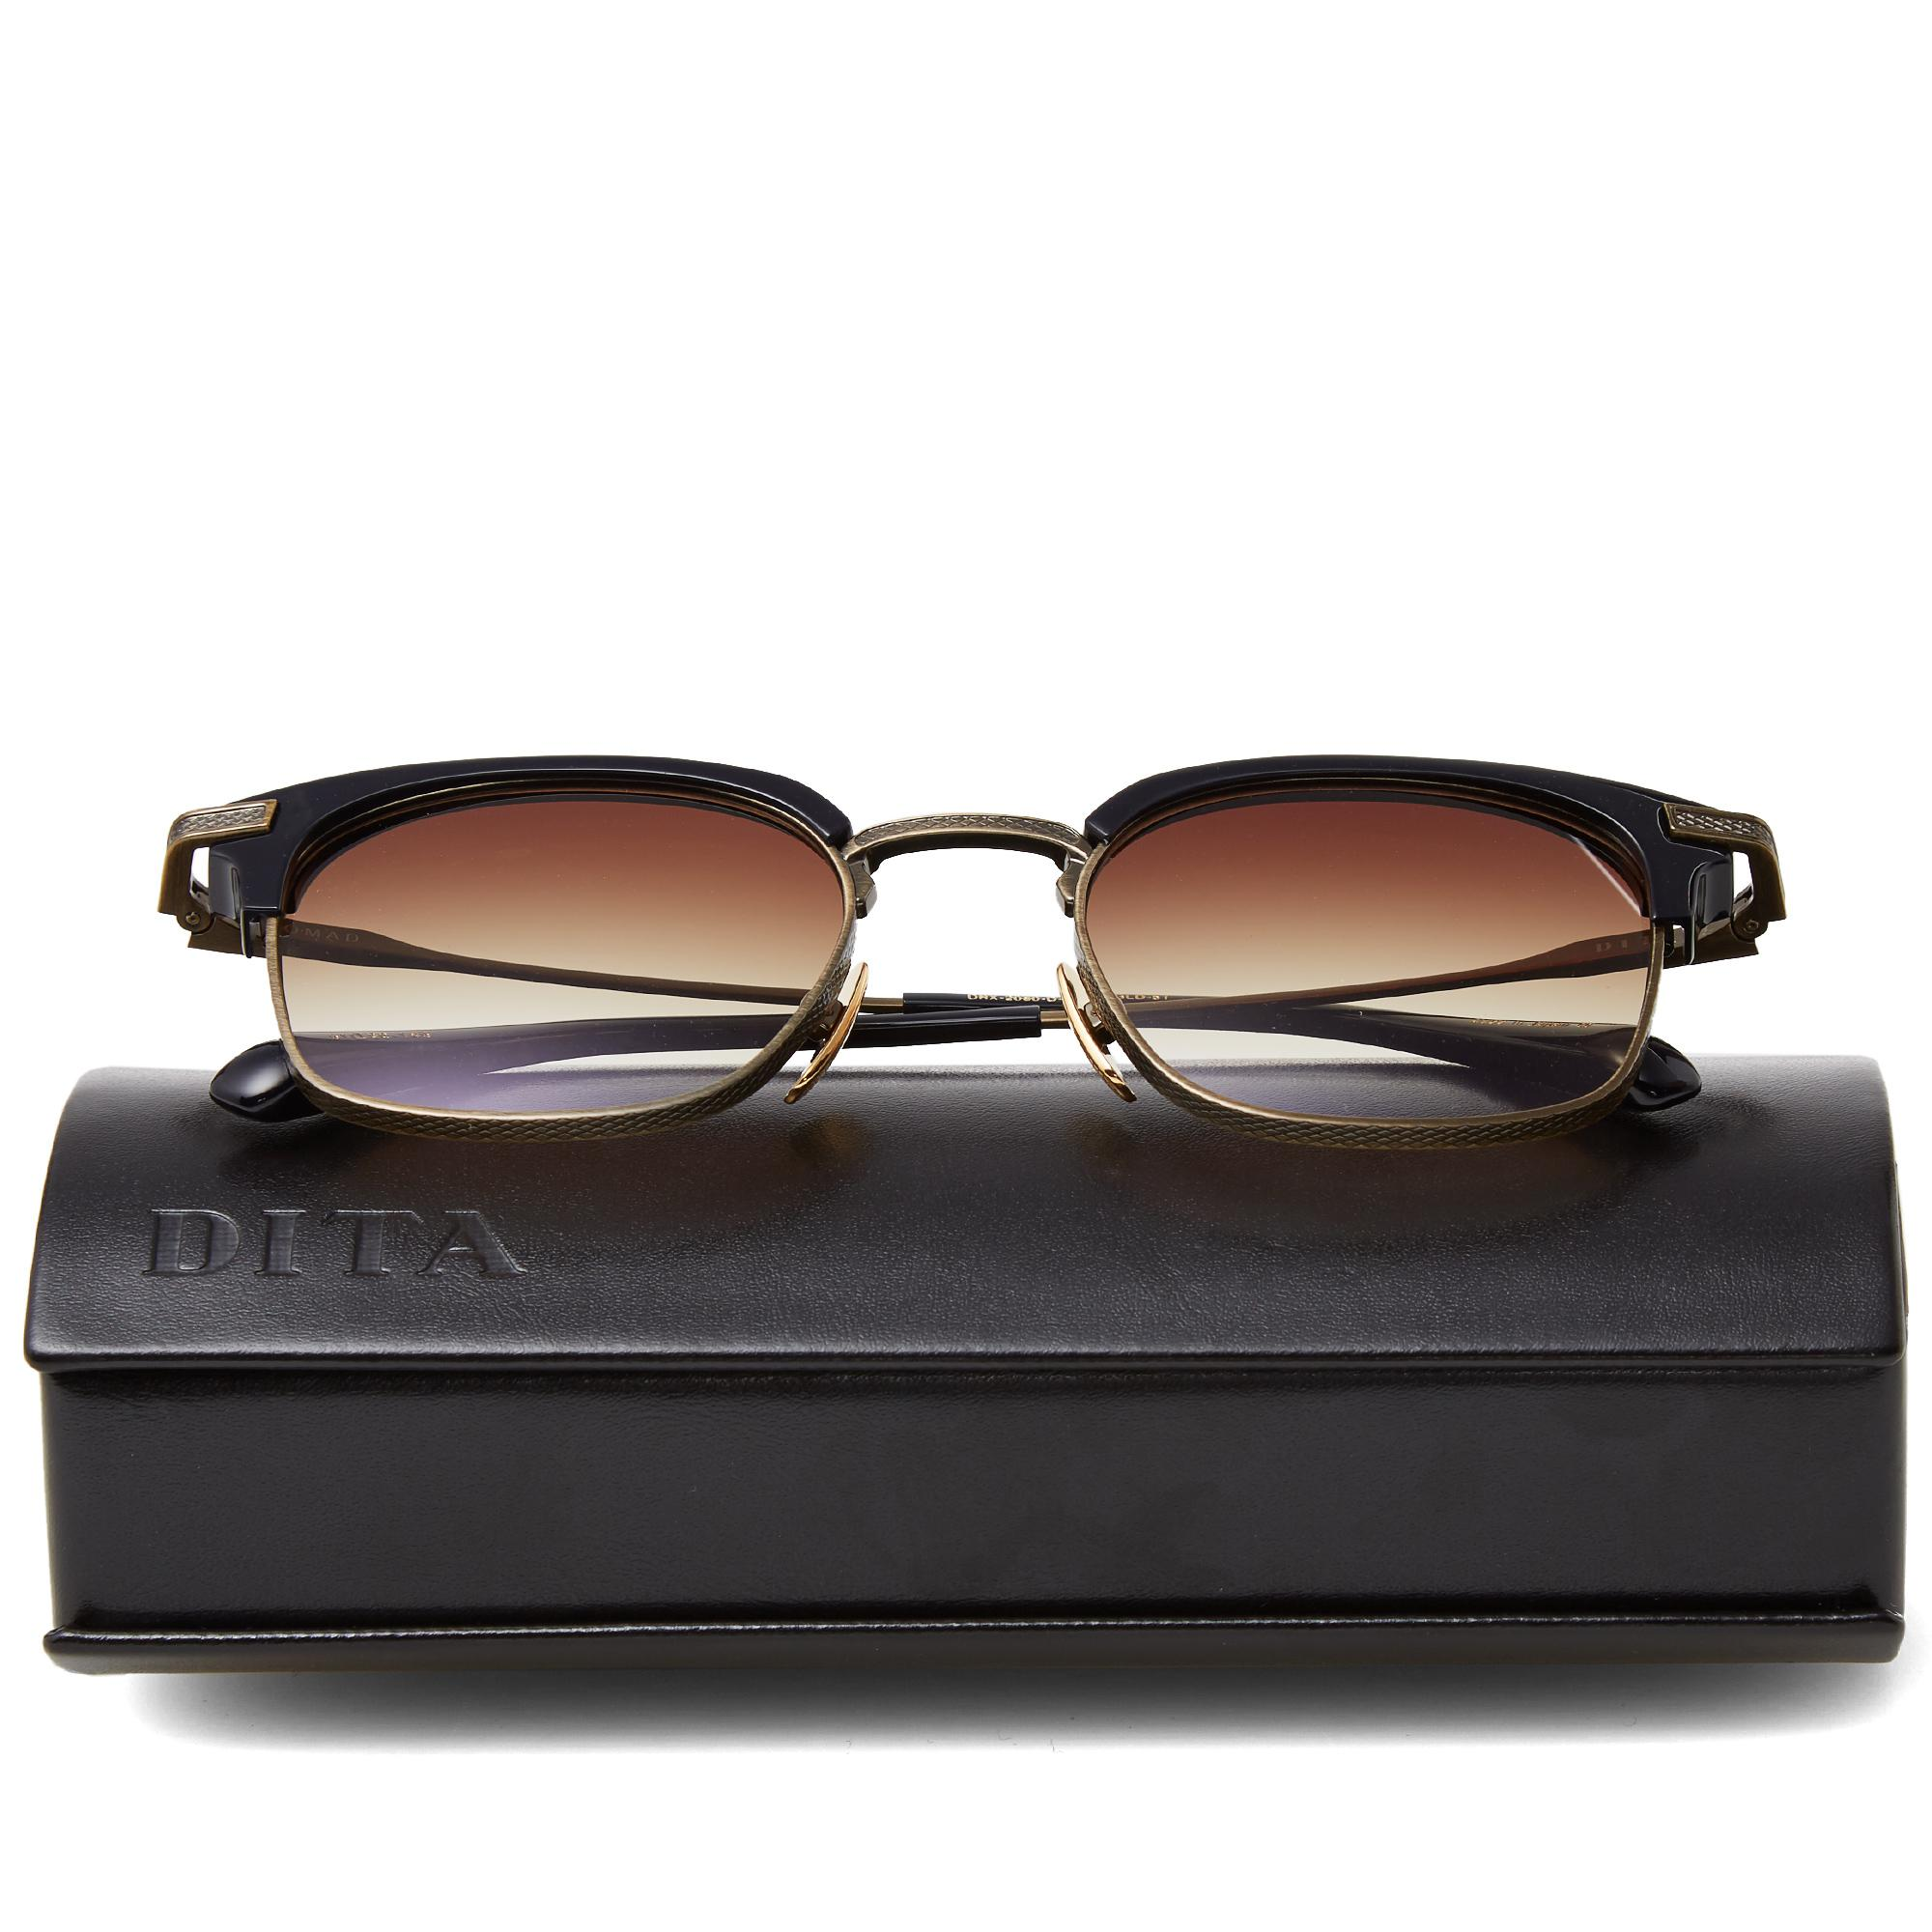 867236c5d4 Dita - Blue Nomad Sunglasses for Men - Lyst. View fullscreen